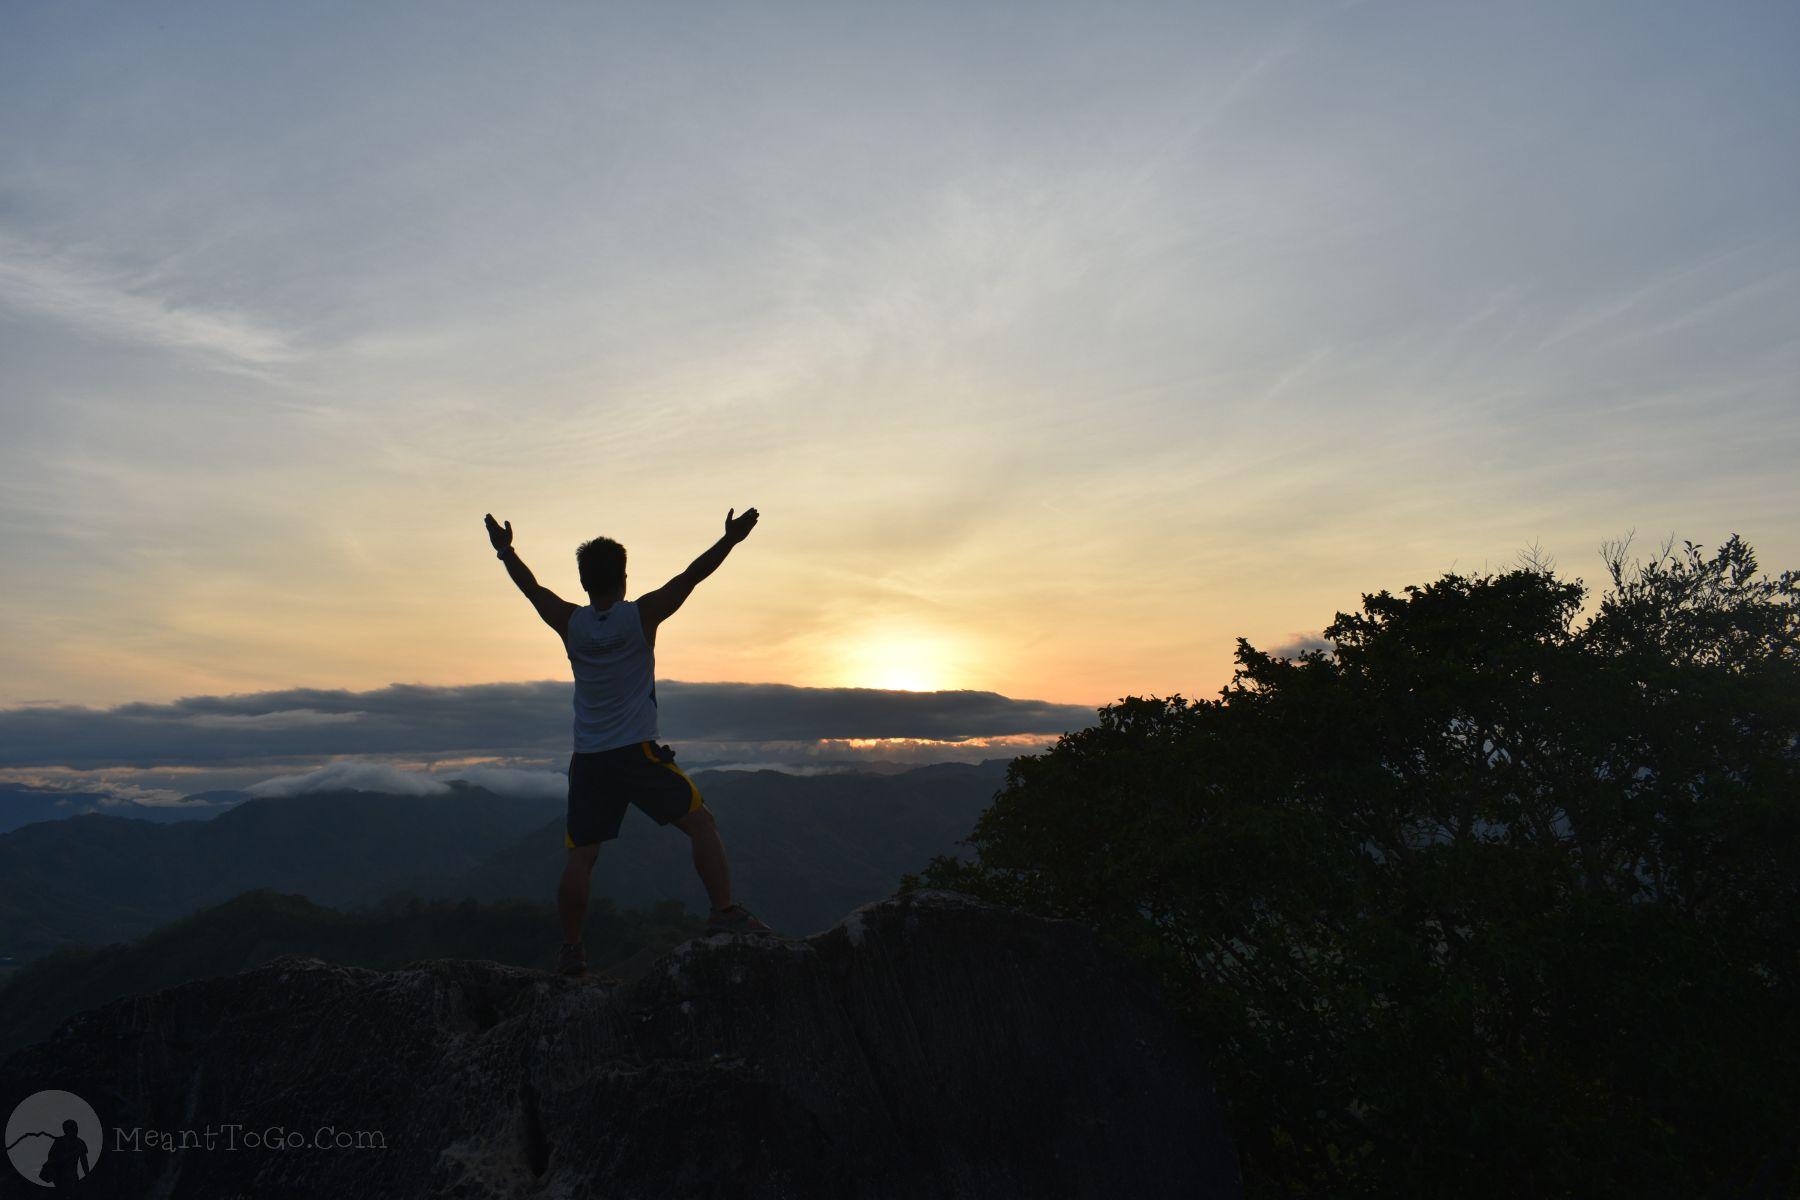 Mt. Capistrano, Malaybalay, Bukidnon, Philippines